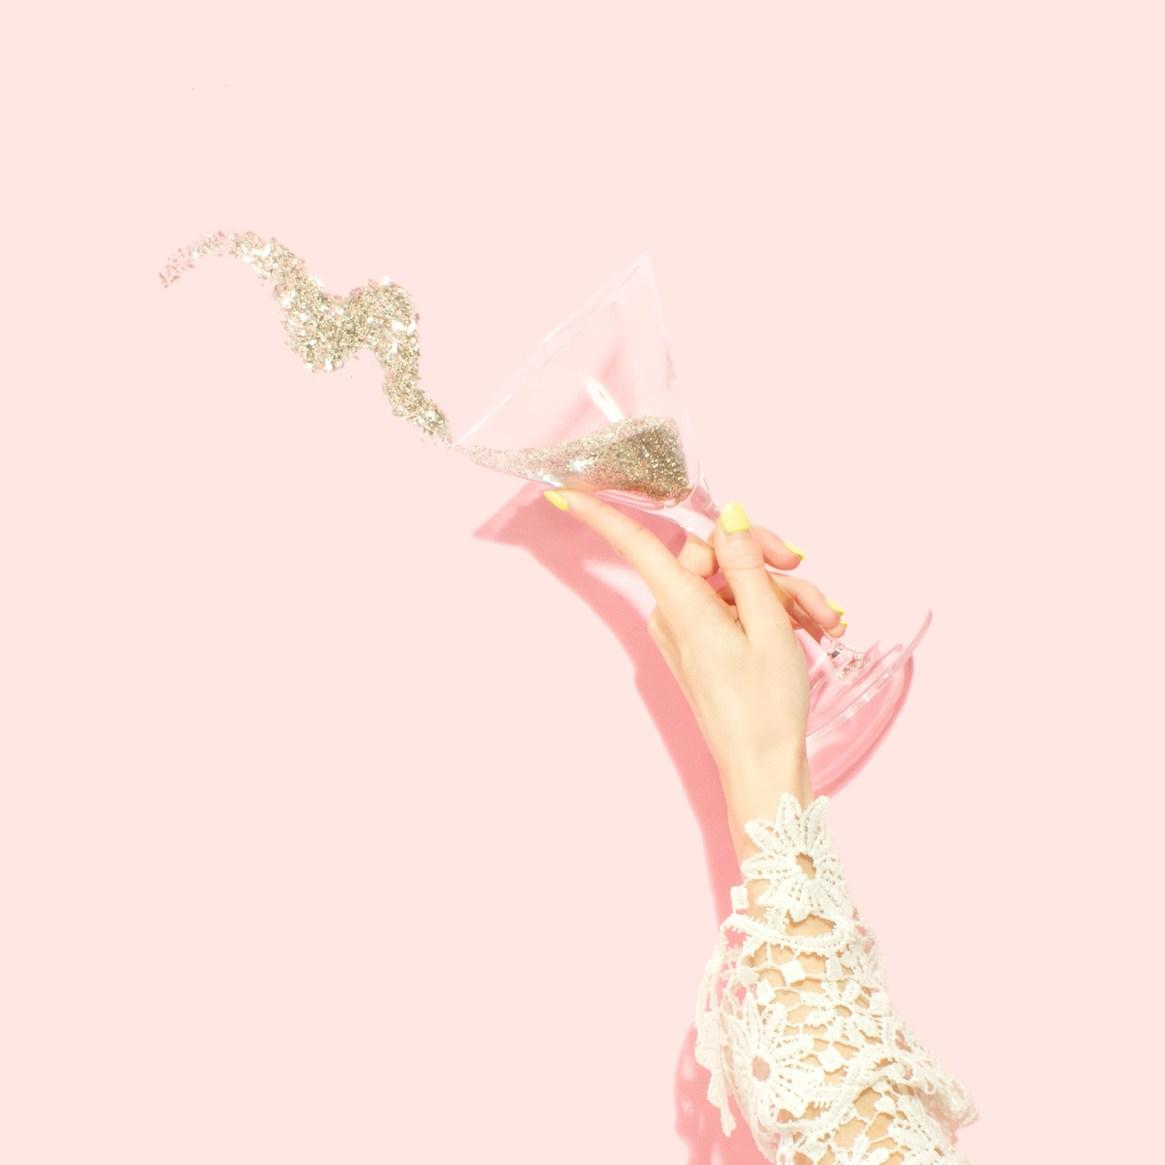 amy-shamblen-Destination-Bridal-Shower-glitter-champagne-ellwed-unsplash